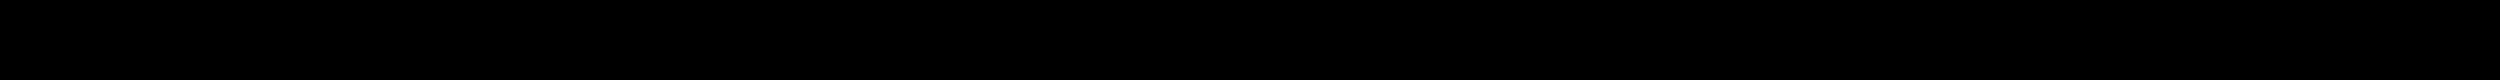 line1.png